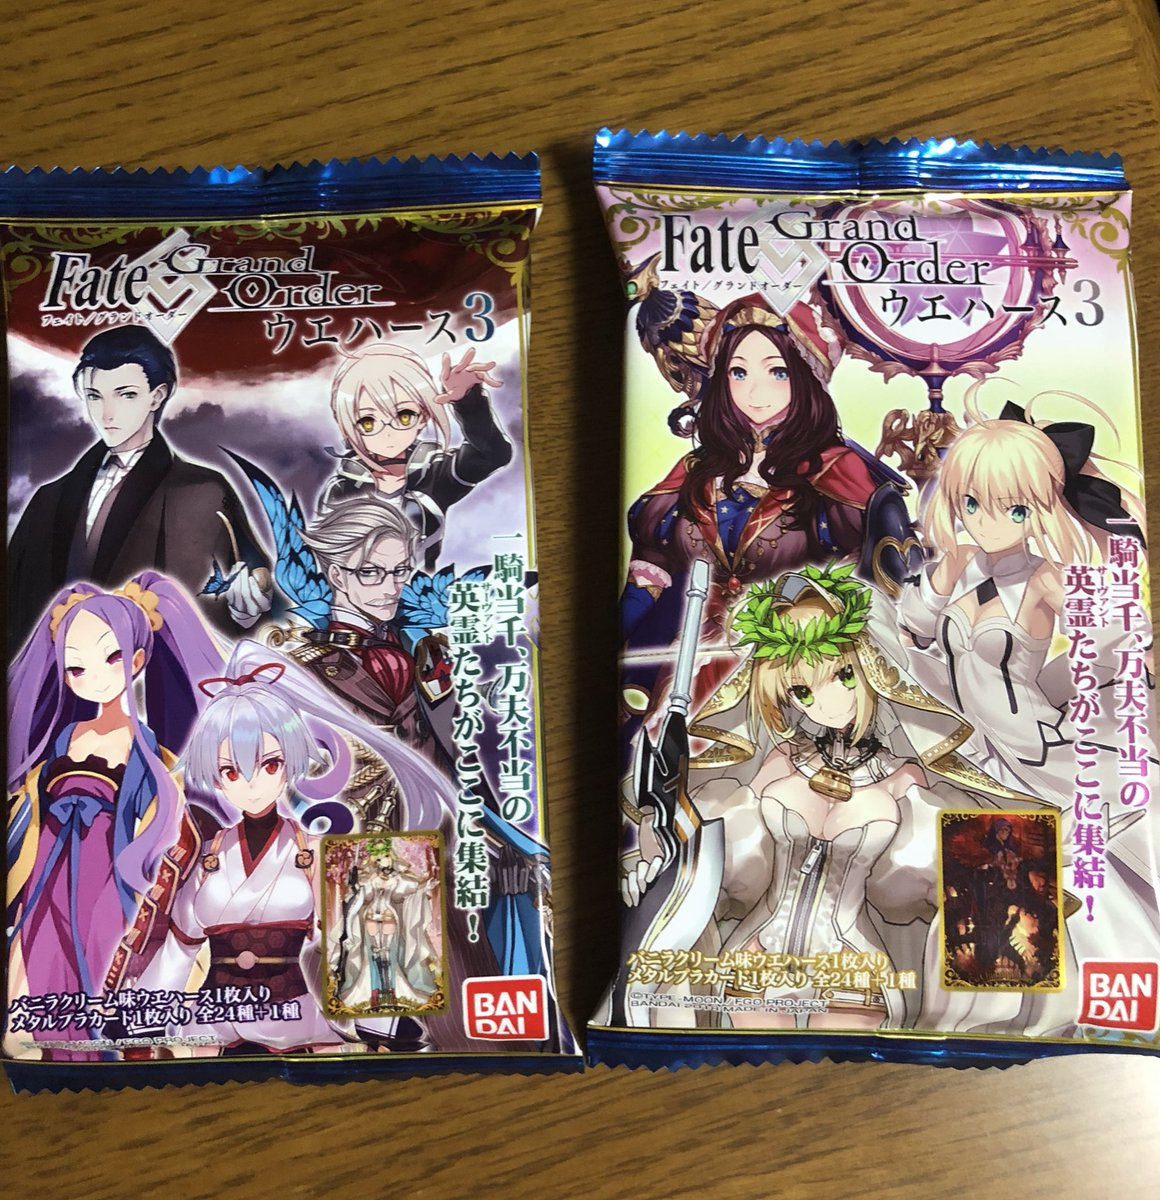 Fate/Grand Orderウエハース3に関する画像16